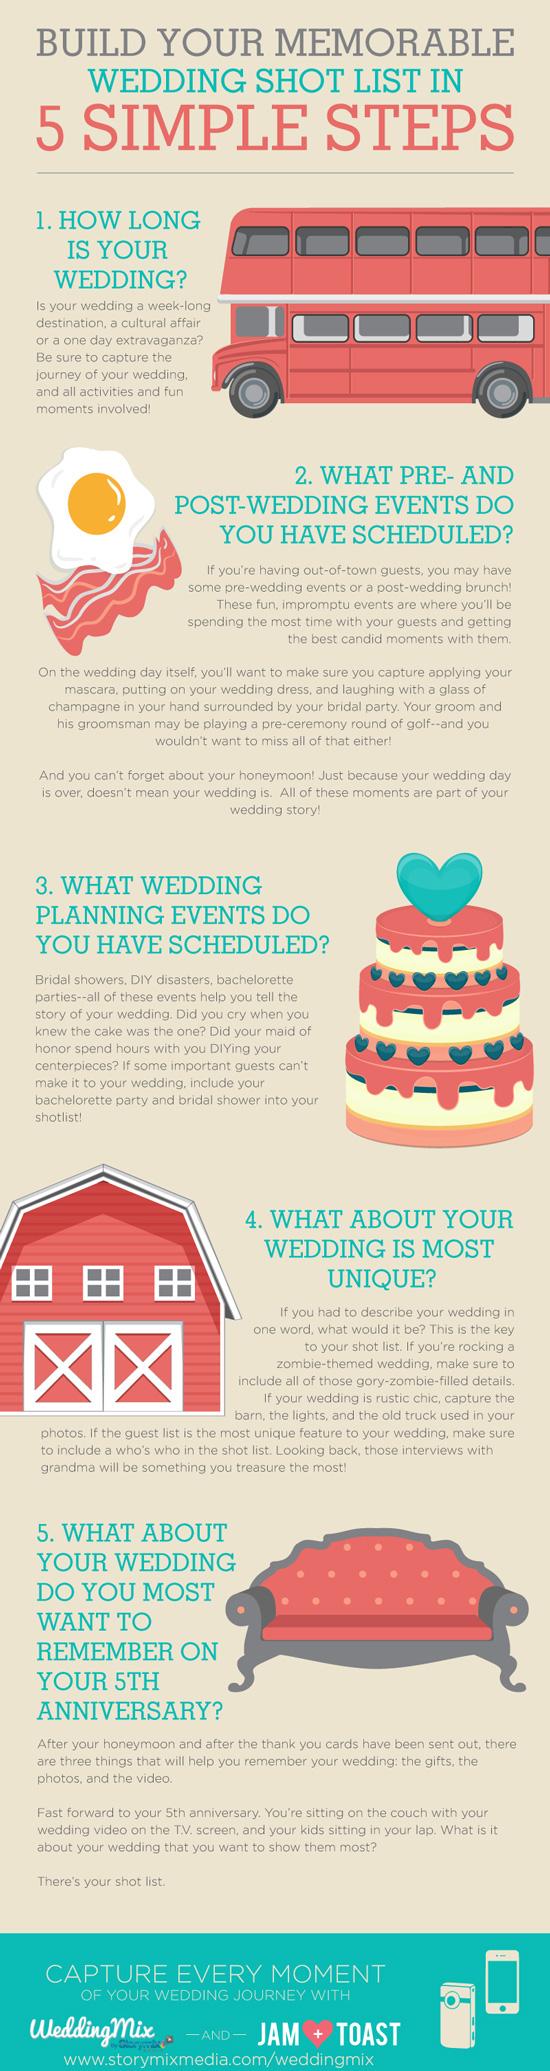 wedding shot list inspiration